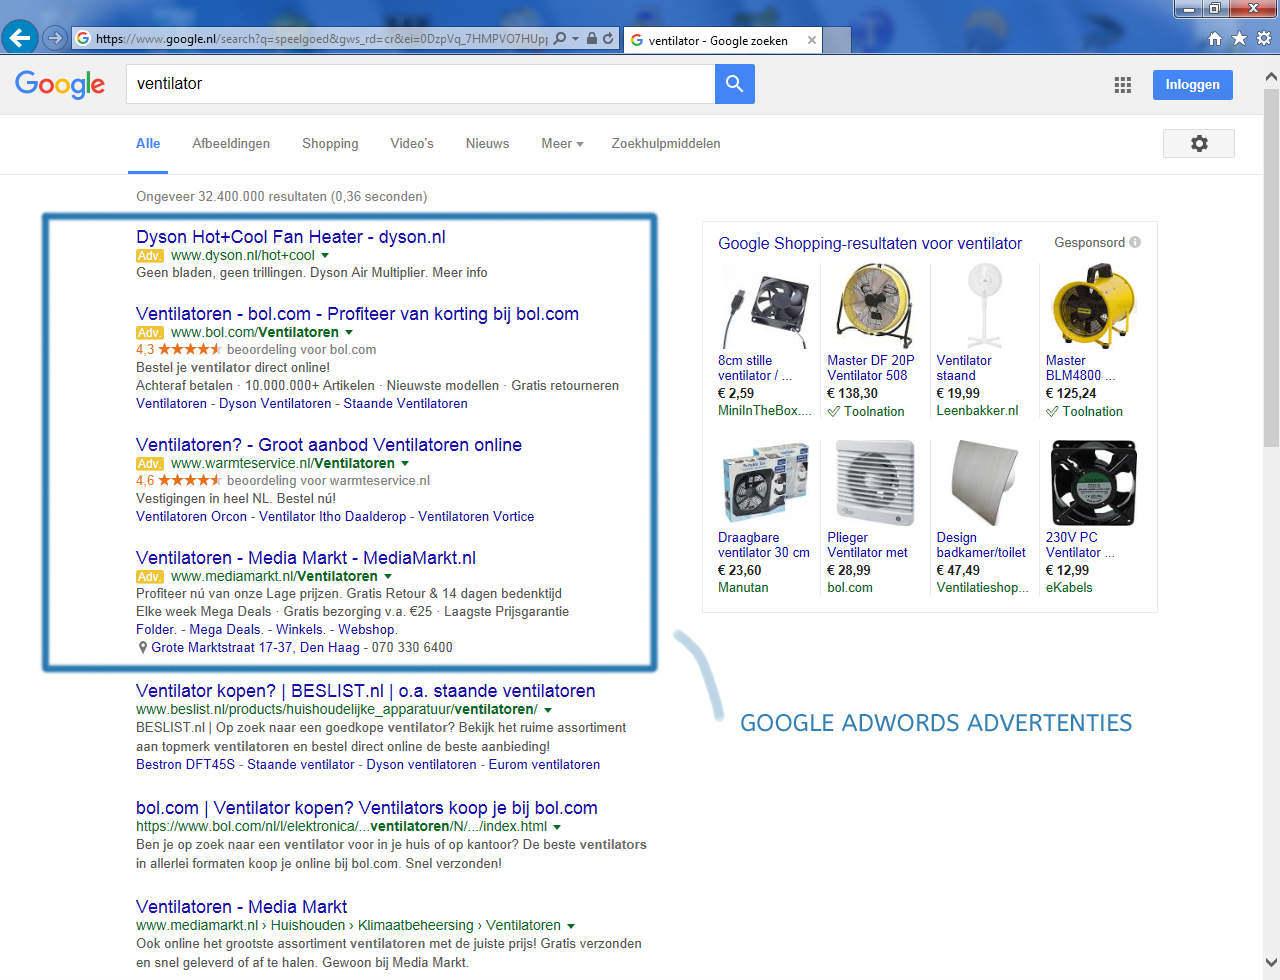 Google Adwords advertenties